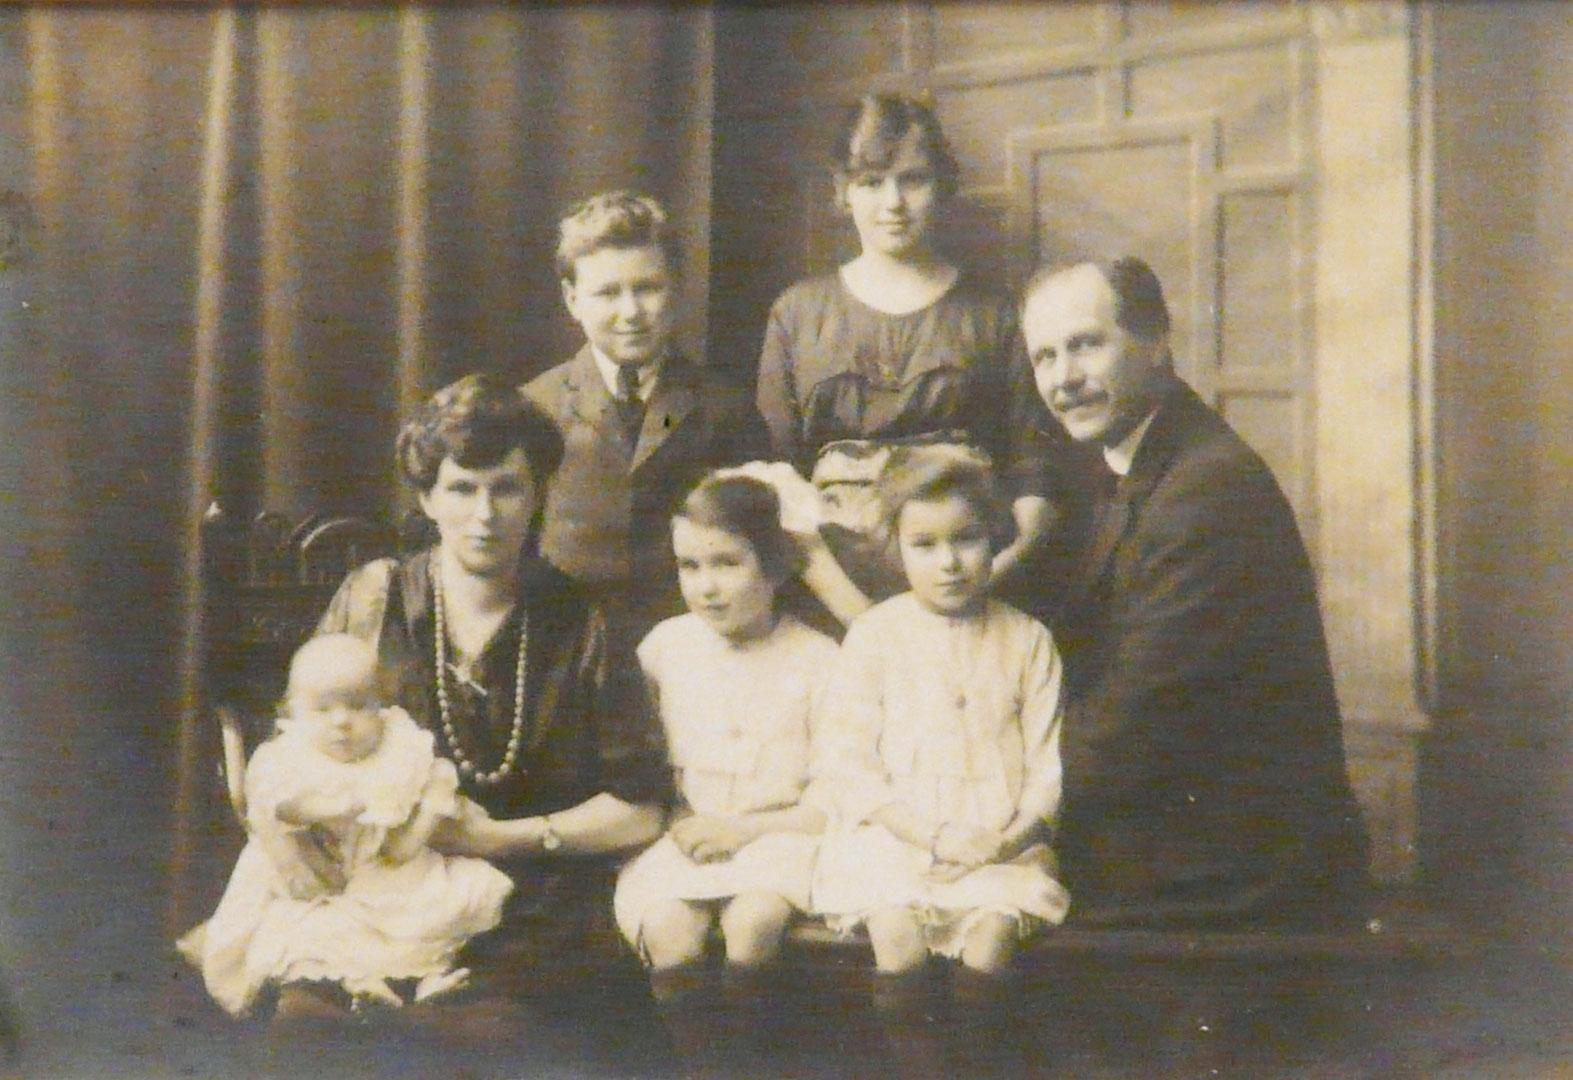 John Rossiter 3rd and Family 1922